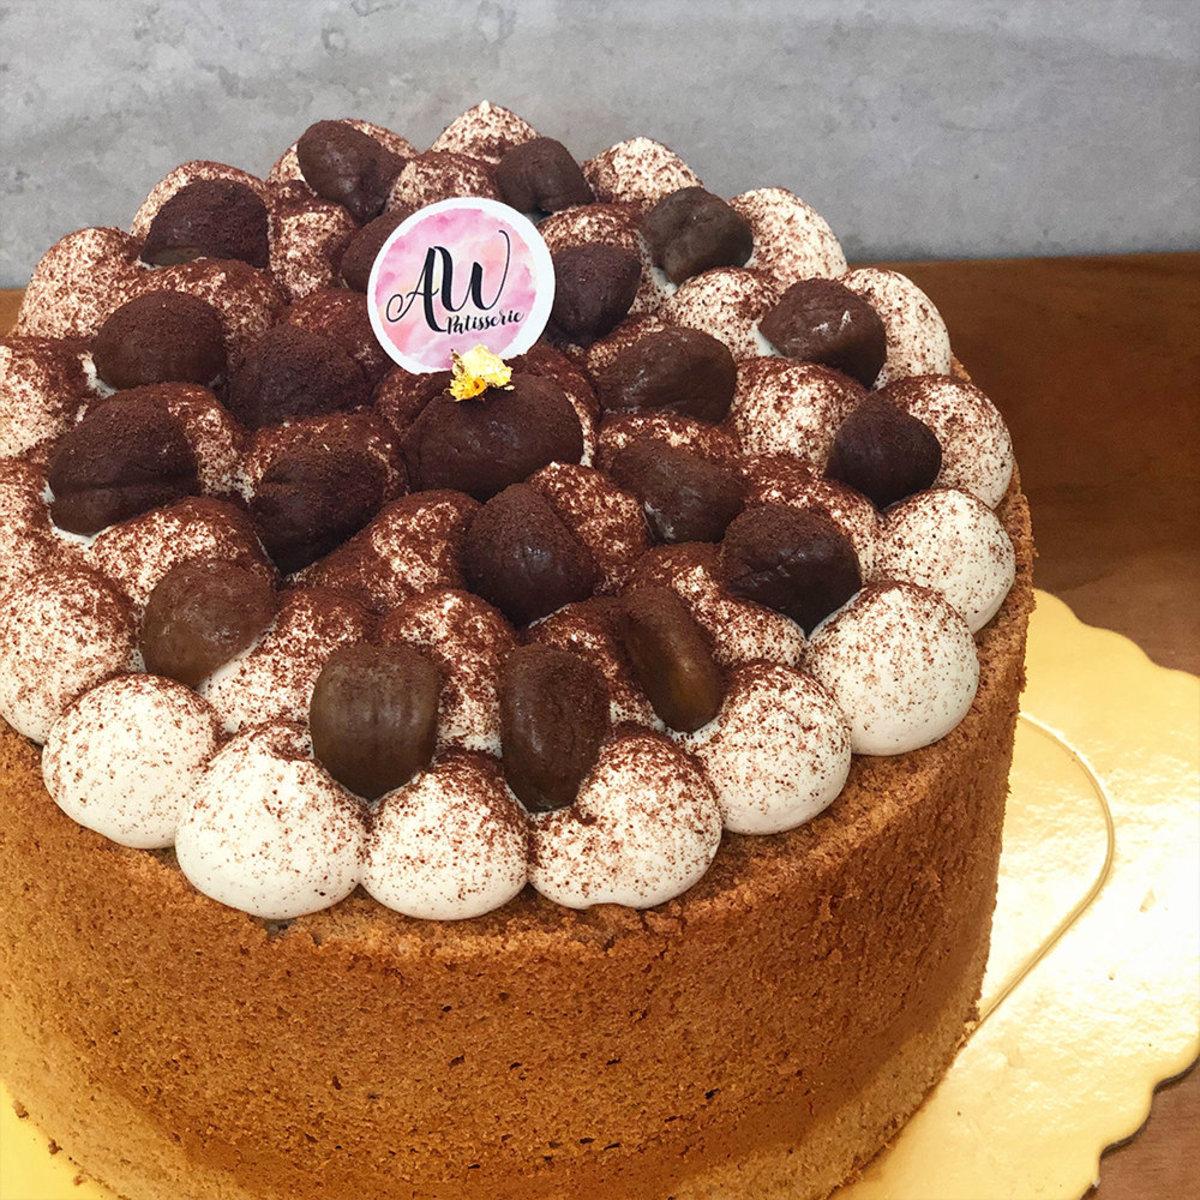 "Autumn Lava Chestnut 8"" Chiffon cake"